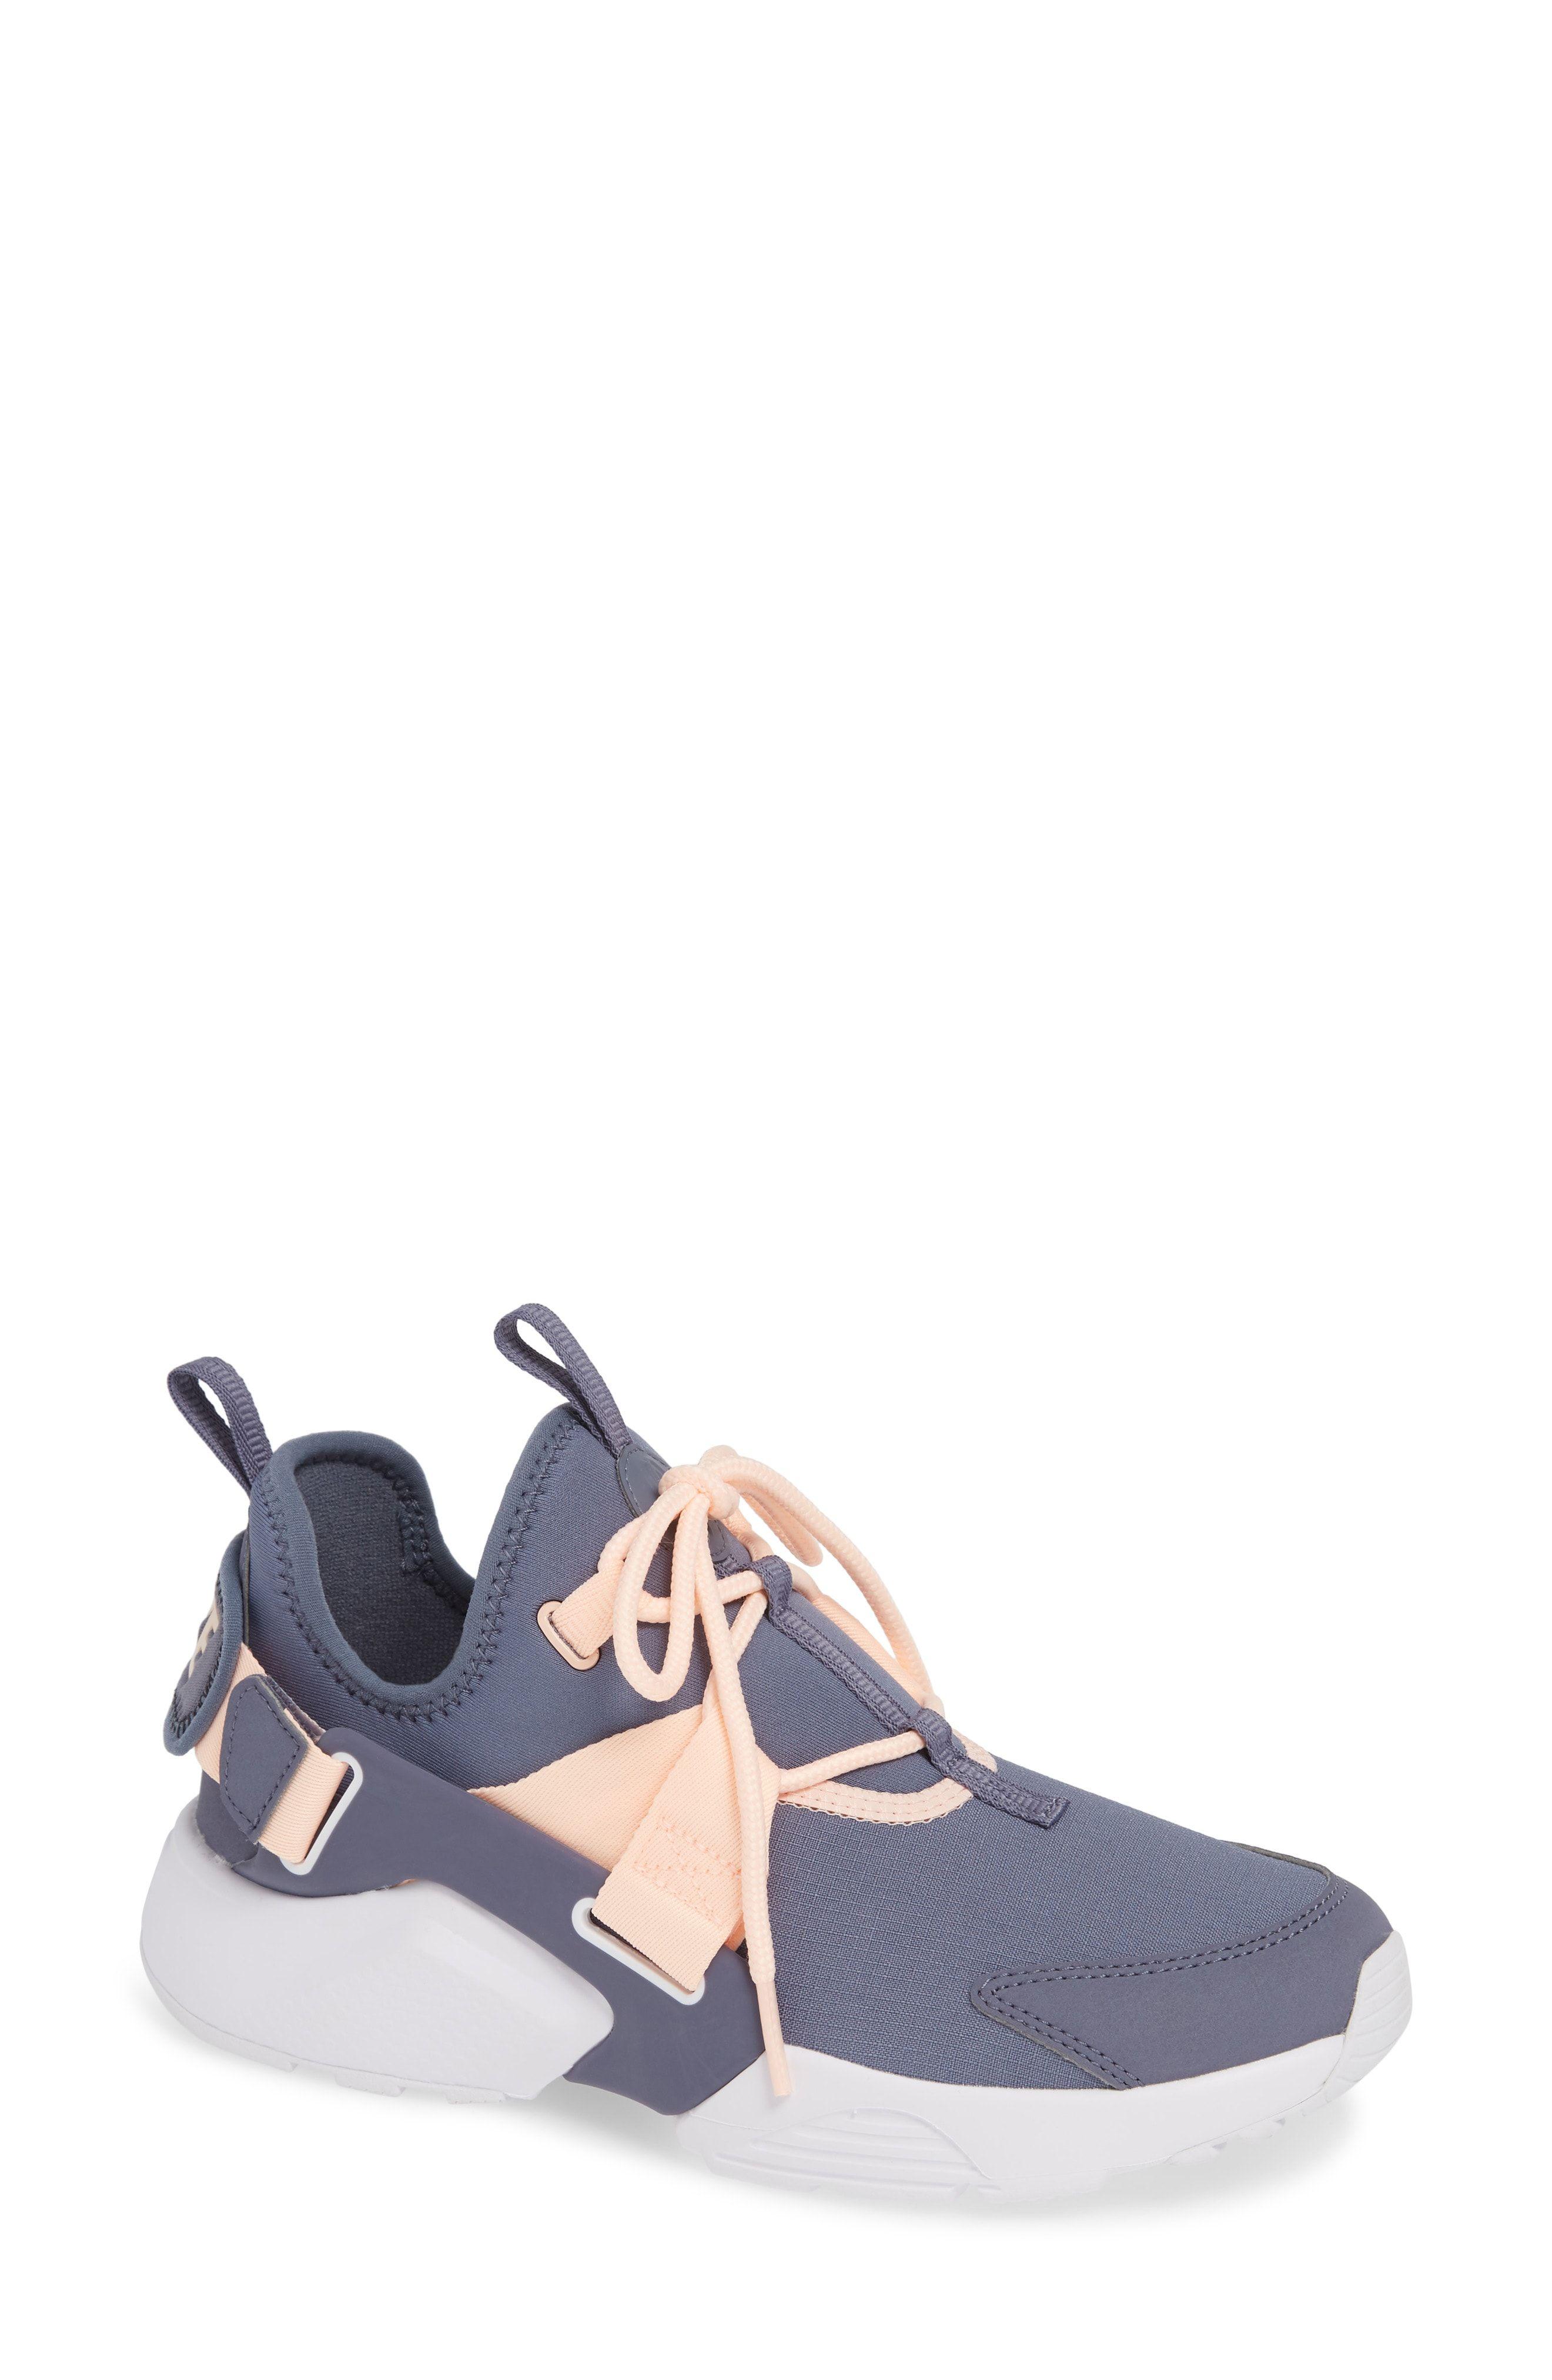 new arrival b1a51 d09d5 Nike Air Huarache City Sneaker In Light Carbon  Carbon- Tint